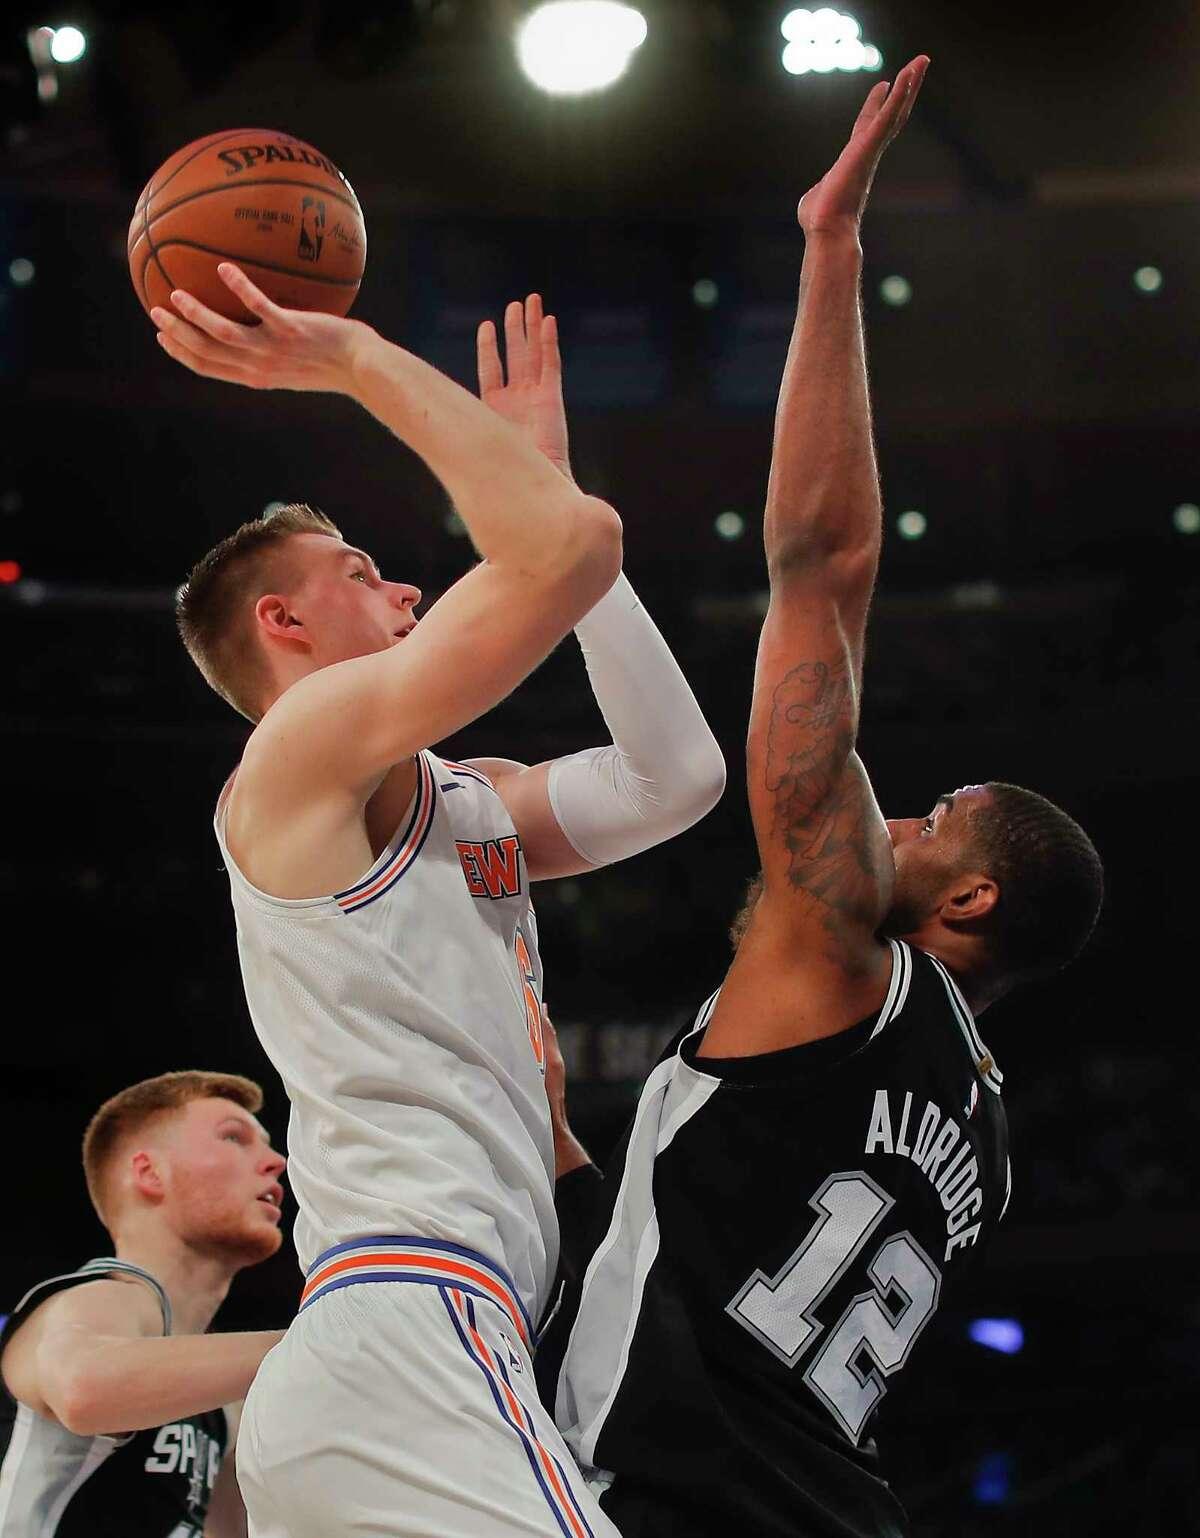 New York Knicks forward Kristaps Porzingis (6) puts up a shot against San Antonio Spurs forward LaMarcus Aldridge (12) during the first quarter of an NBA basketball game, Tuesday, Jan. 2, 2018, in New York. (AP Photo/Julie Jacobson)